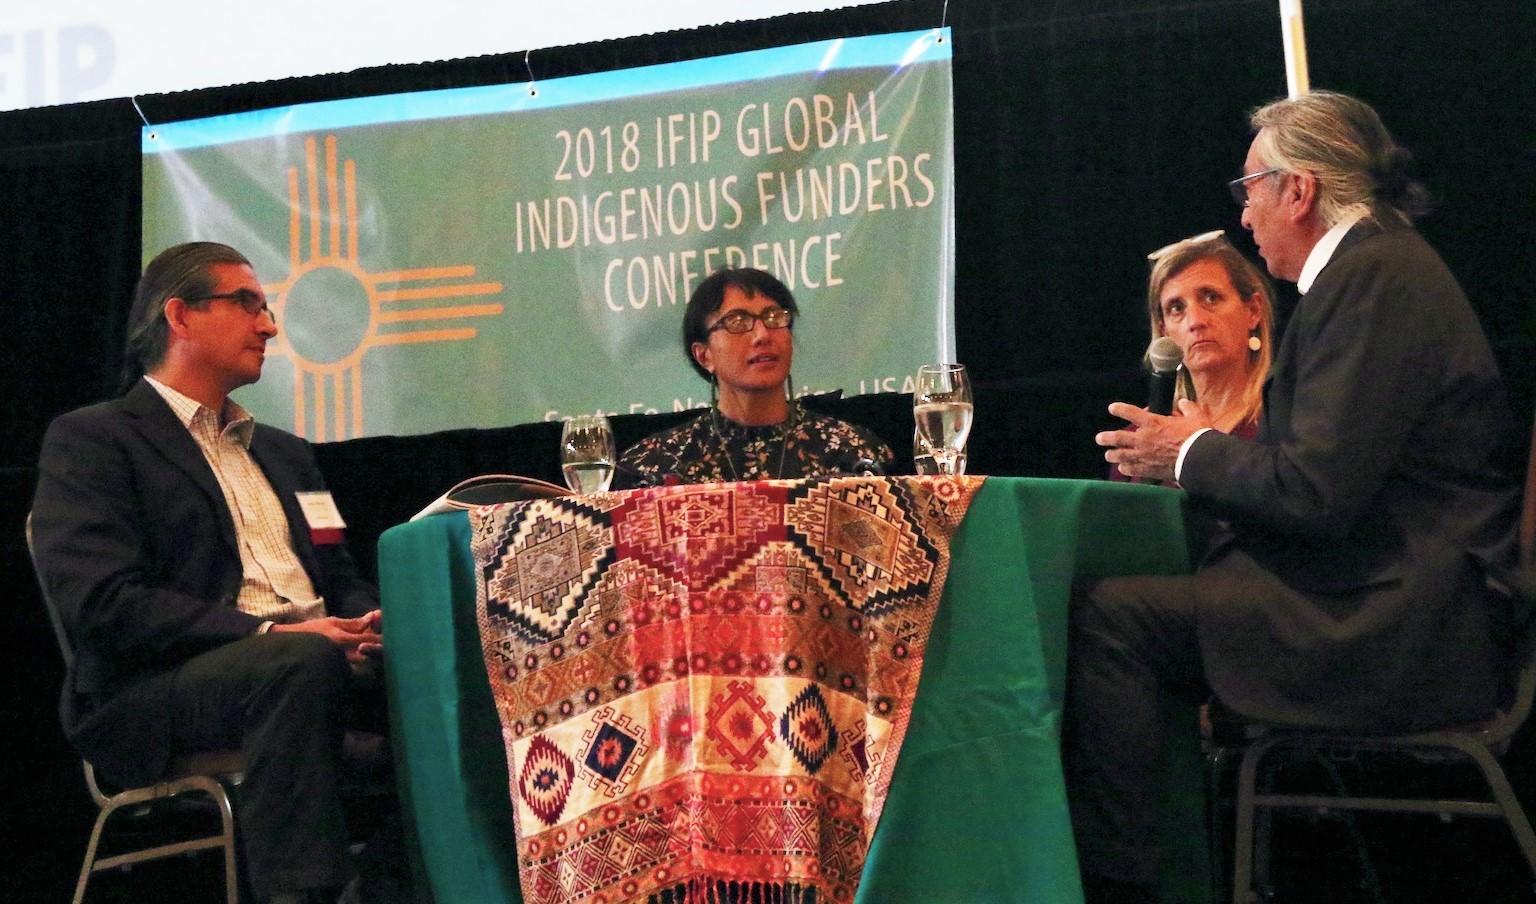 IFIP conference funders panel WK Kellogg, J R McKenzie Trust, Oak Foundation, Colorado Plateau Foundation.jpg